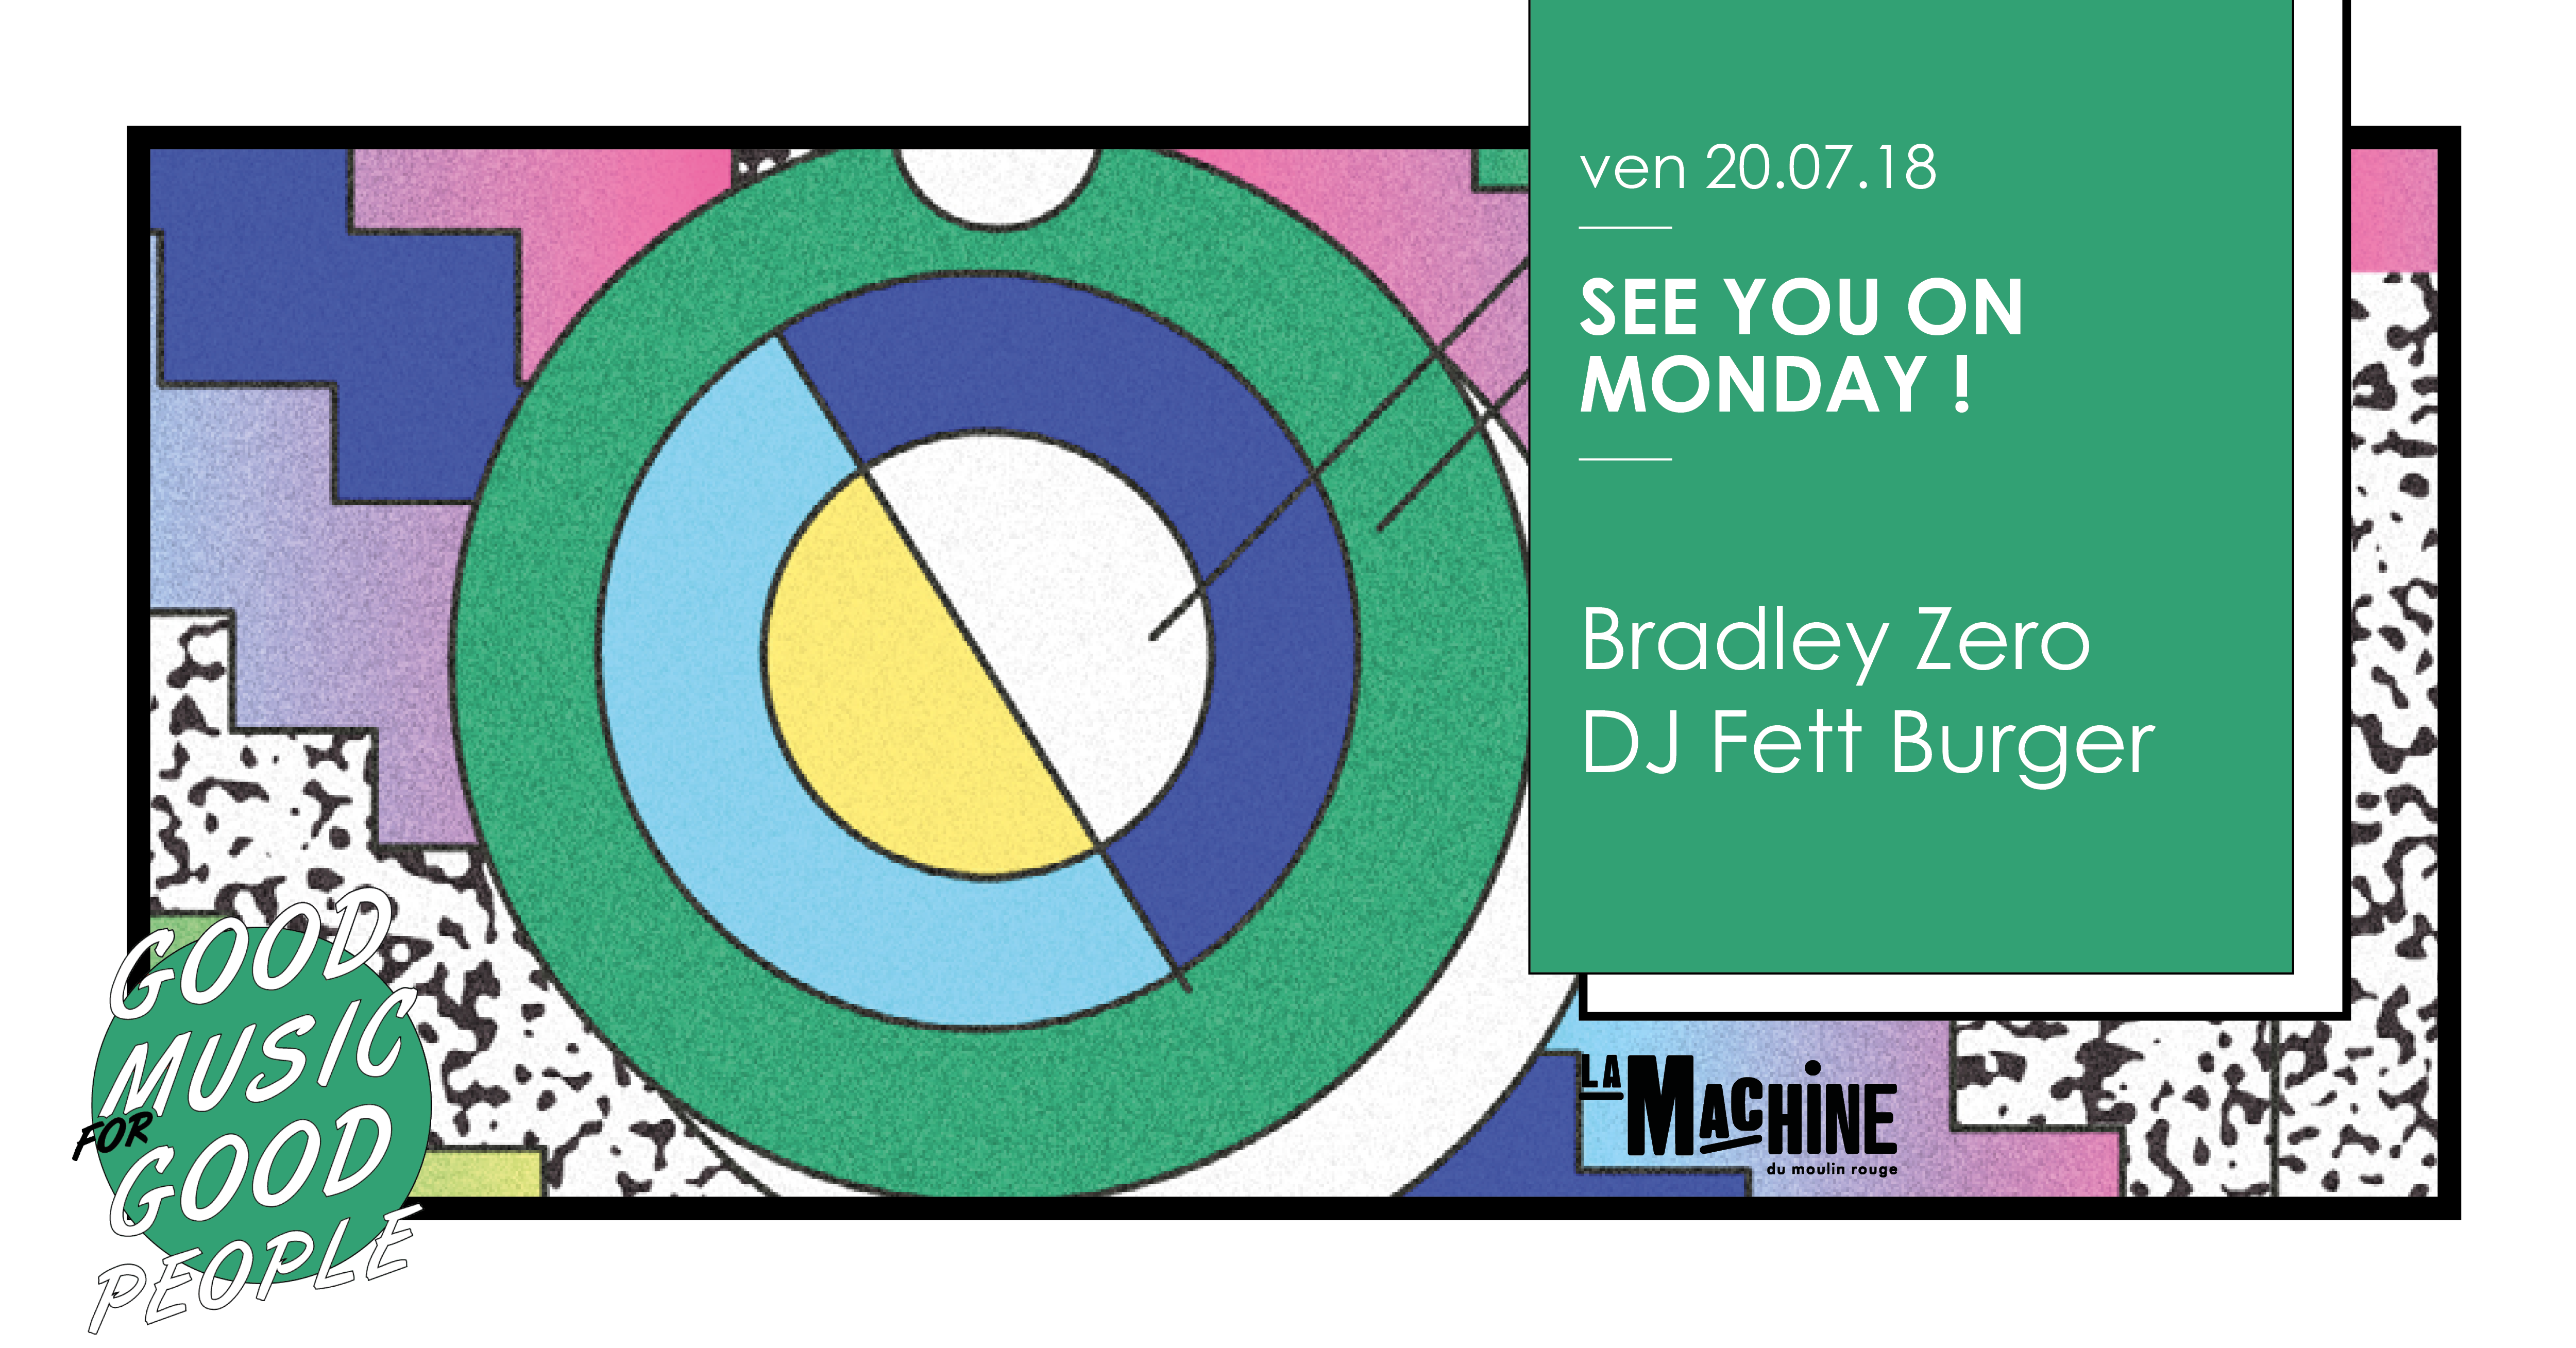 See You On Monday ! Bradley Zero • DJ Fett Burger